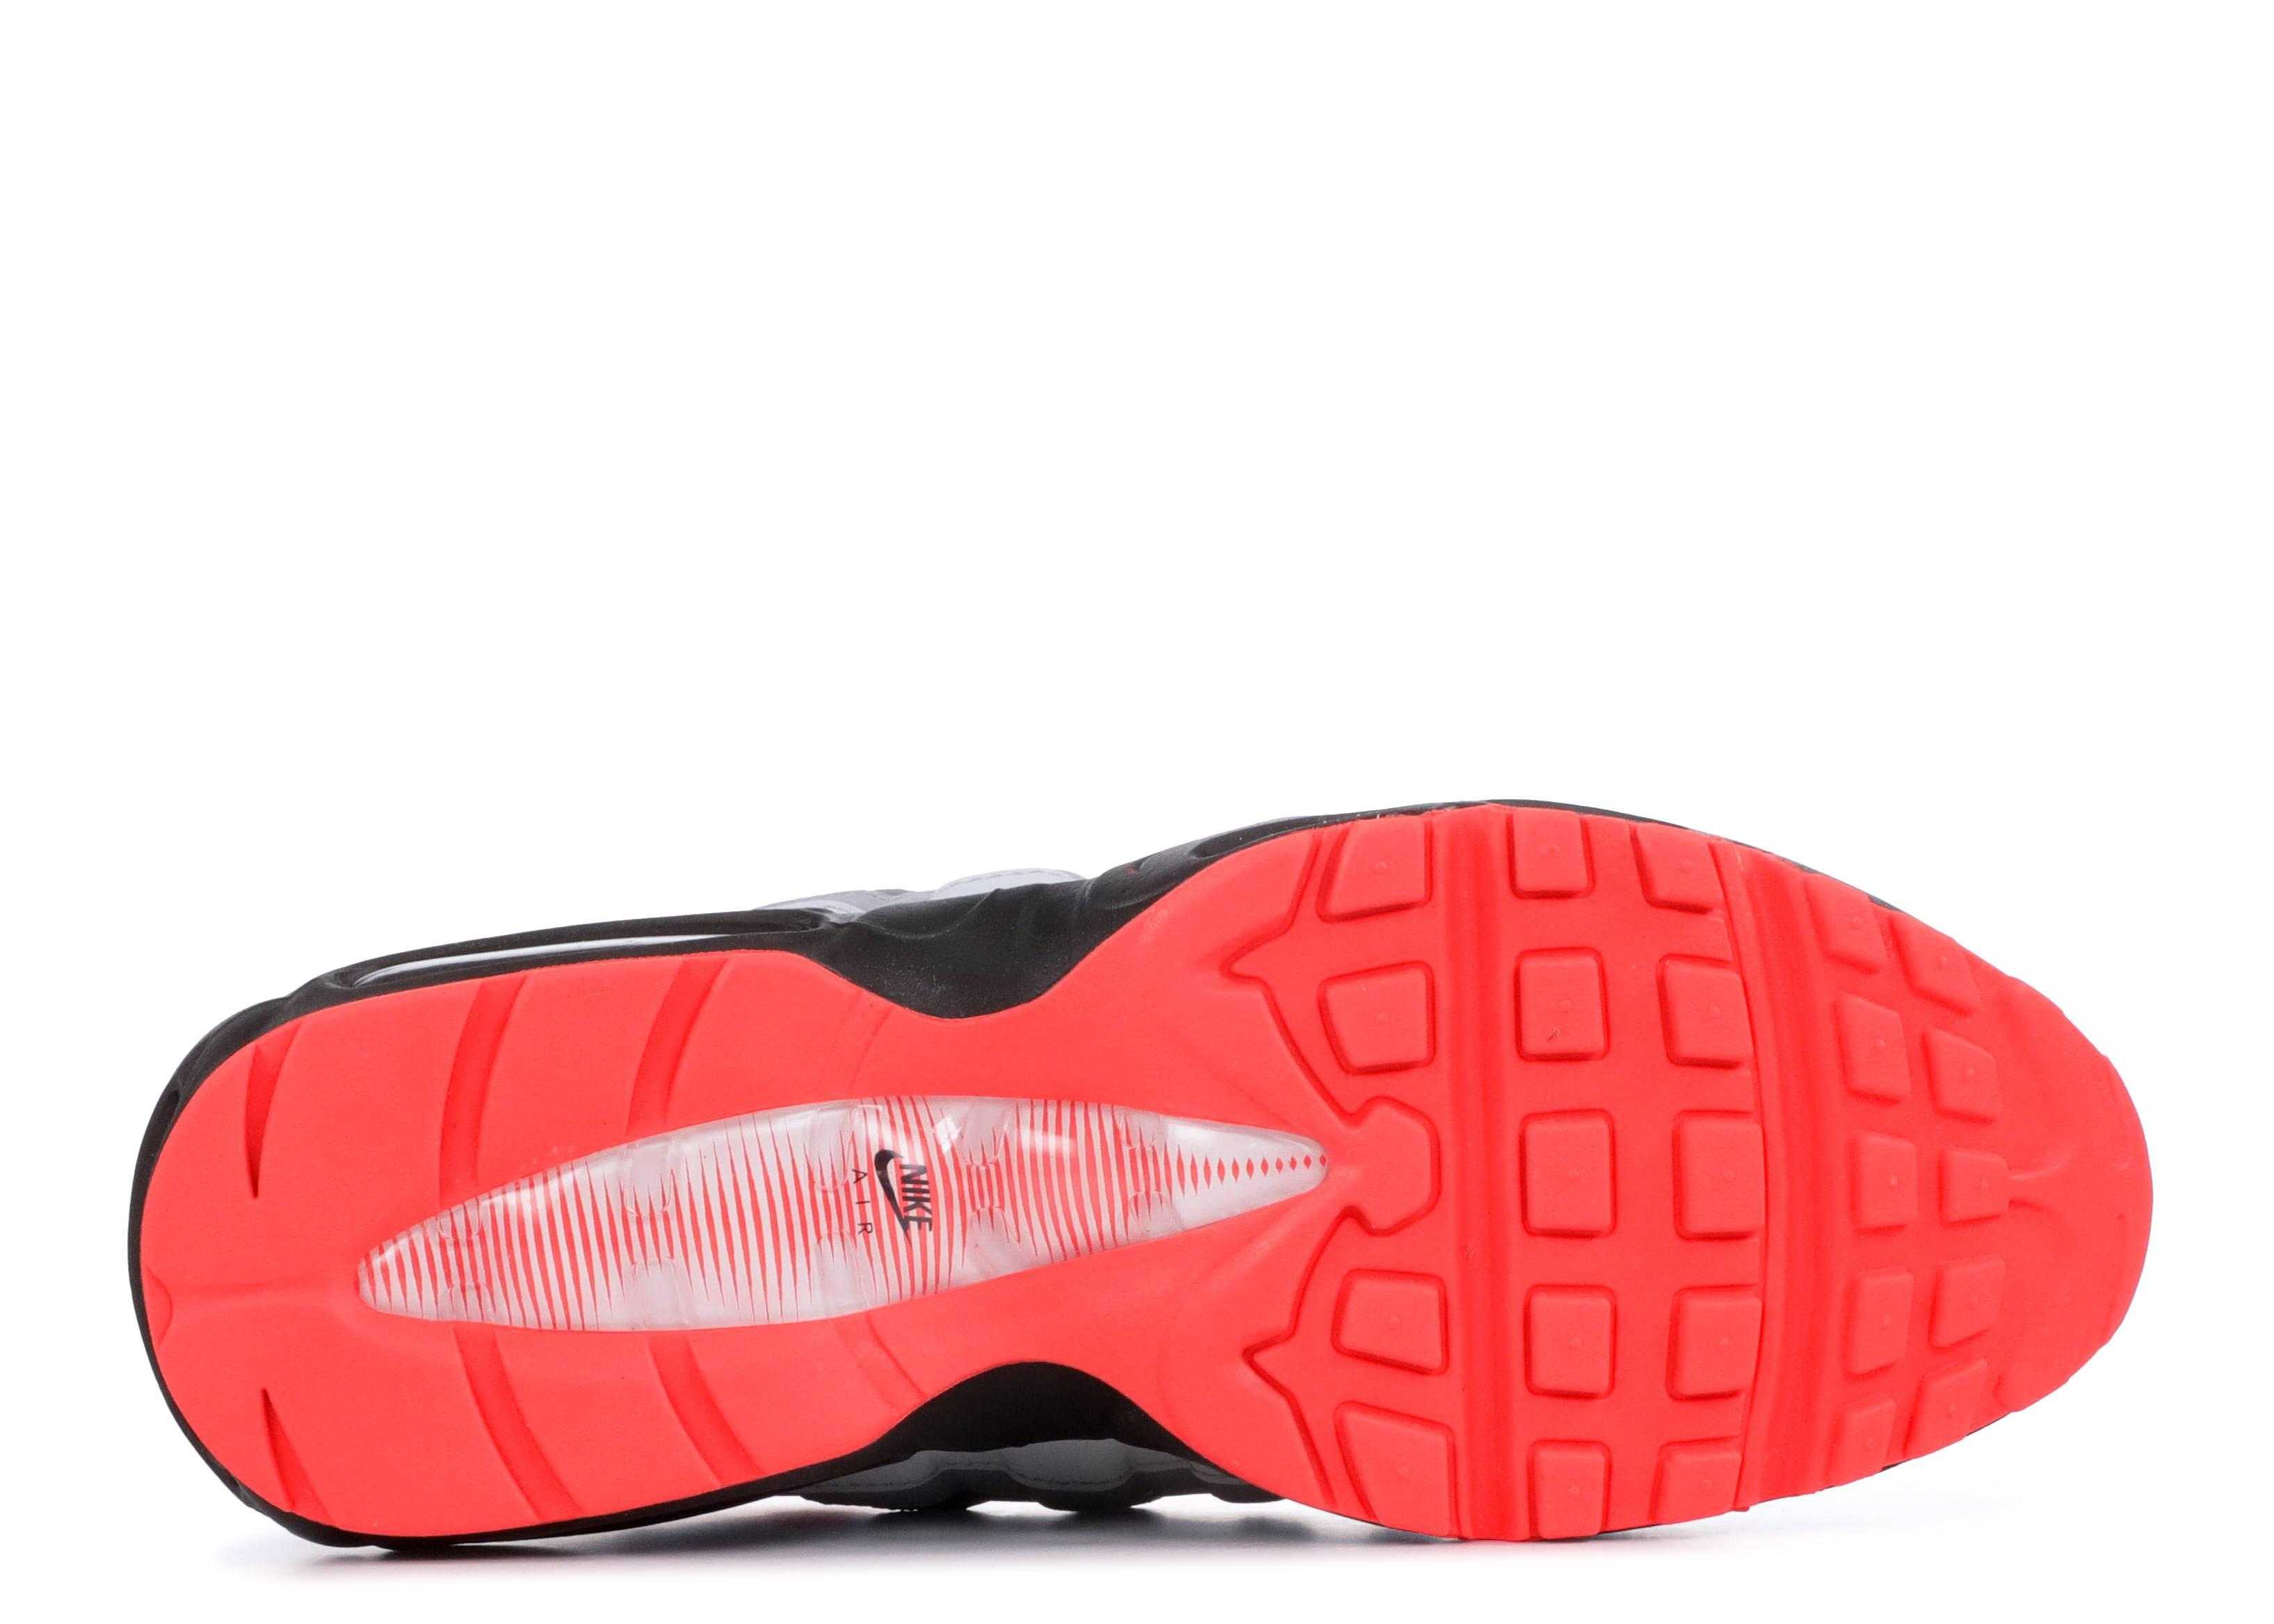 74b9fb78fa203 Nike Air Max 95 Essential